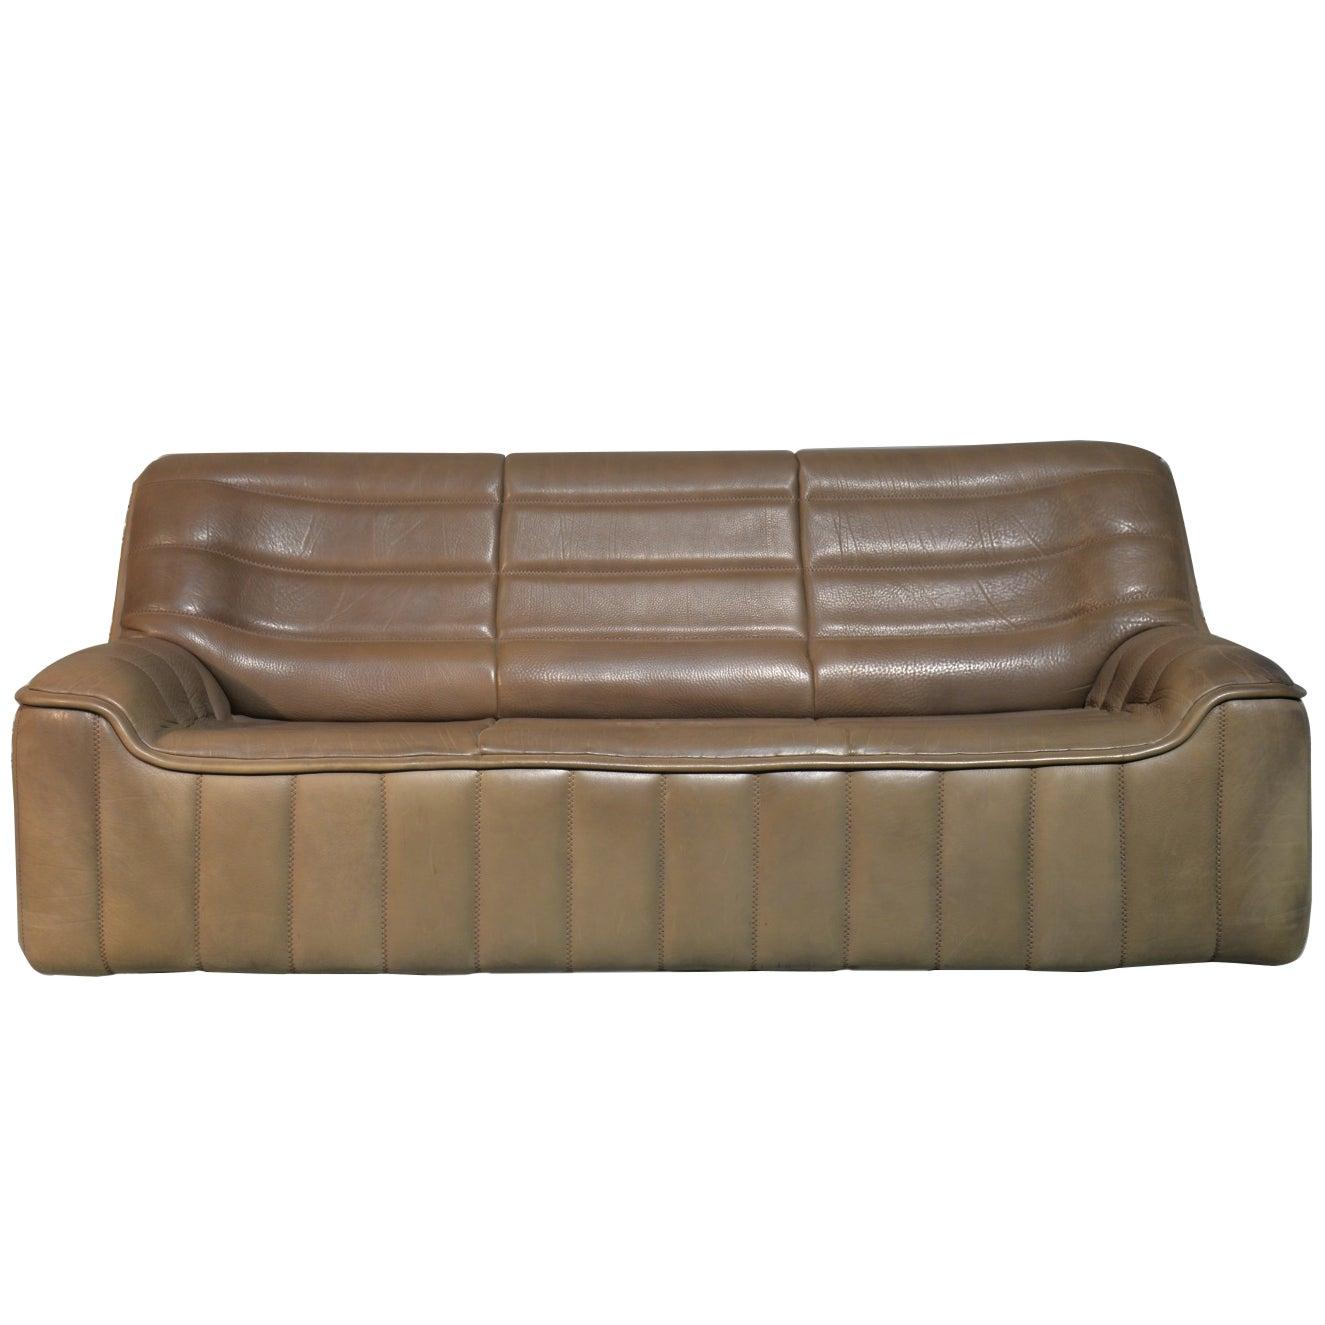 Vintage De Sede DS 84 Leather Sofa, Switzerland, 1970s